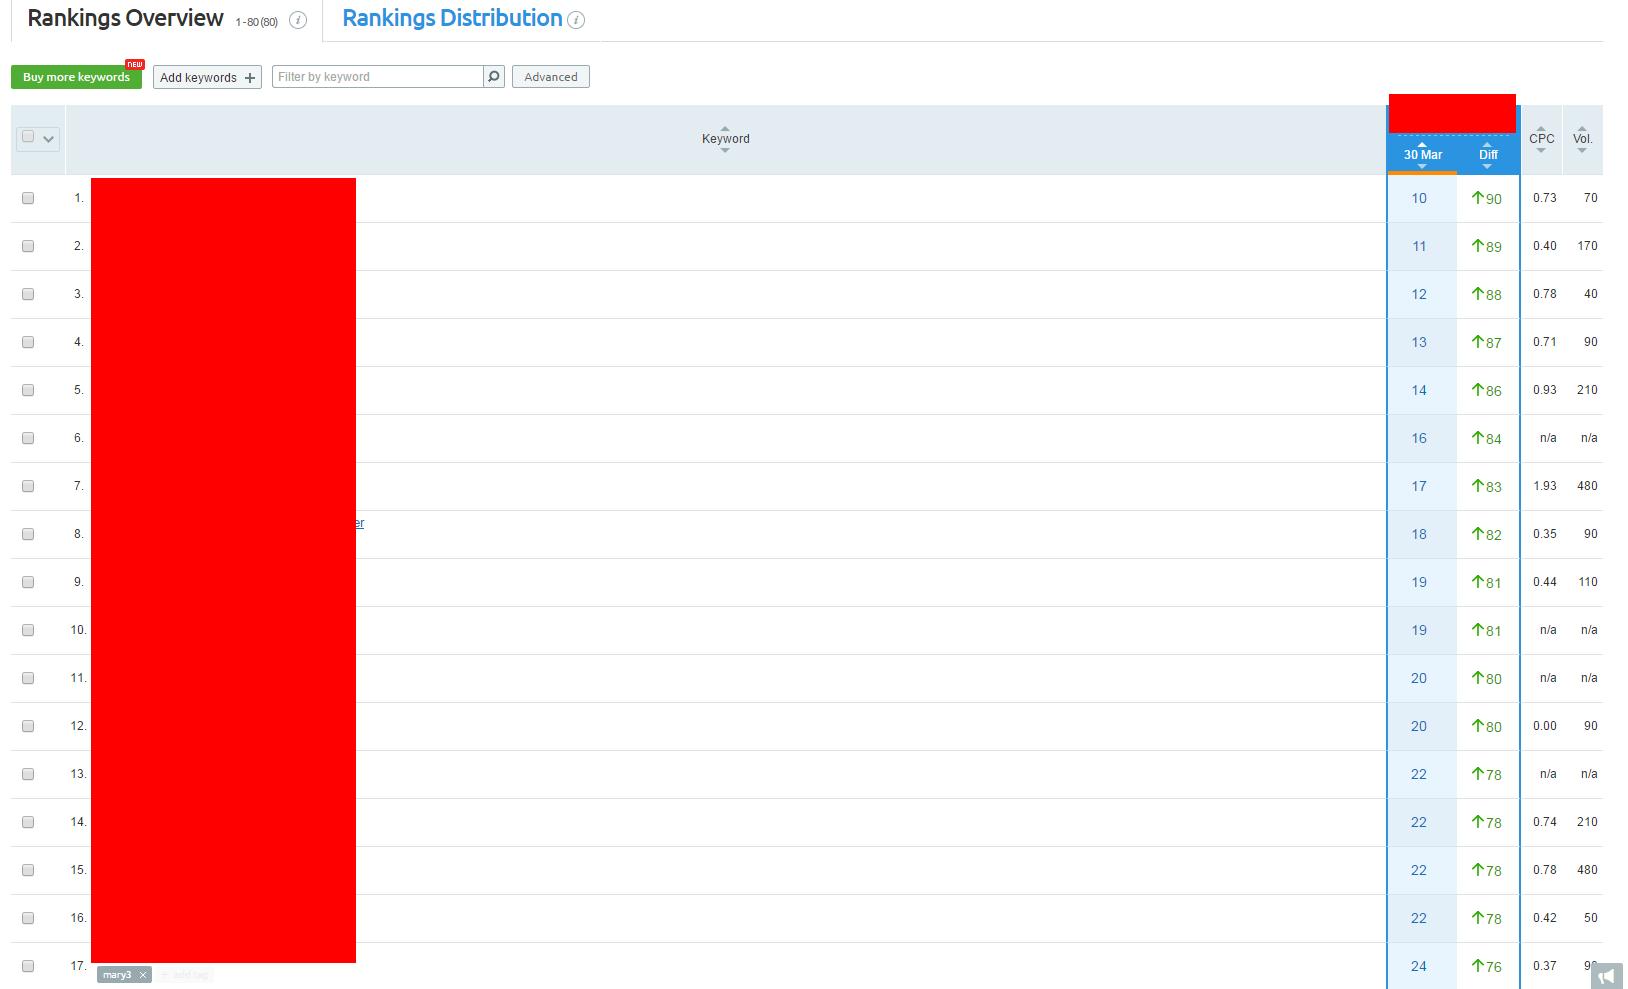 ass site keyword ranking detail as of Mar 30 2016